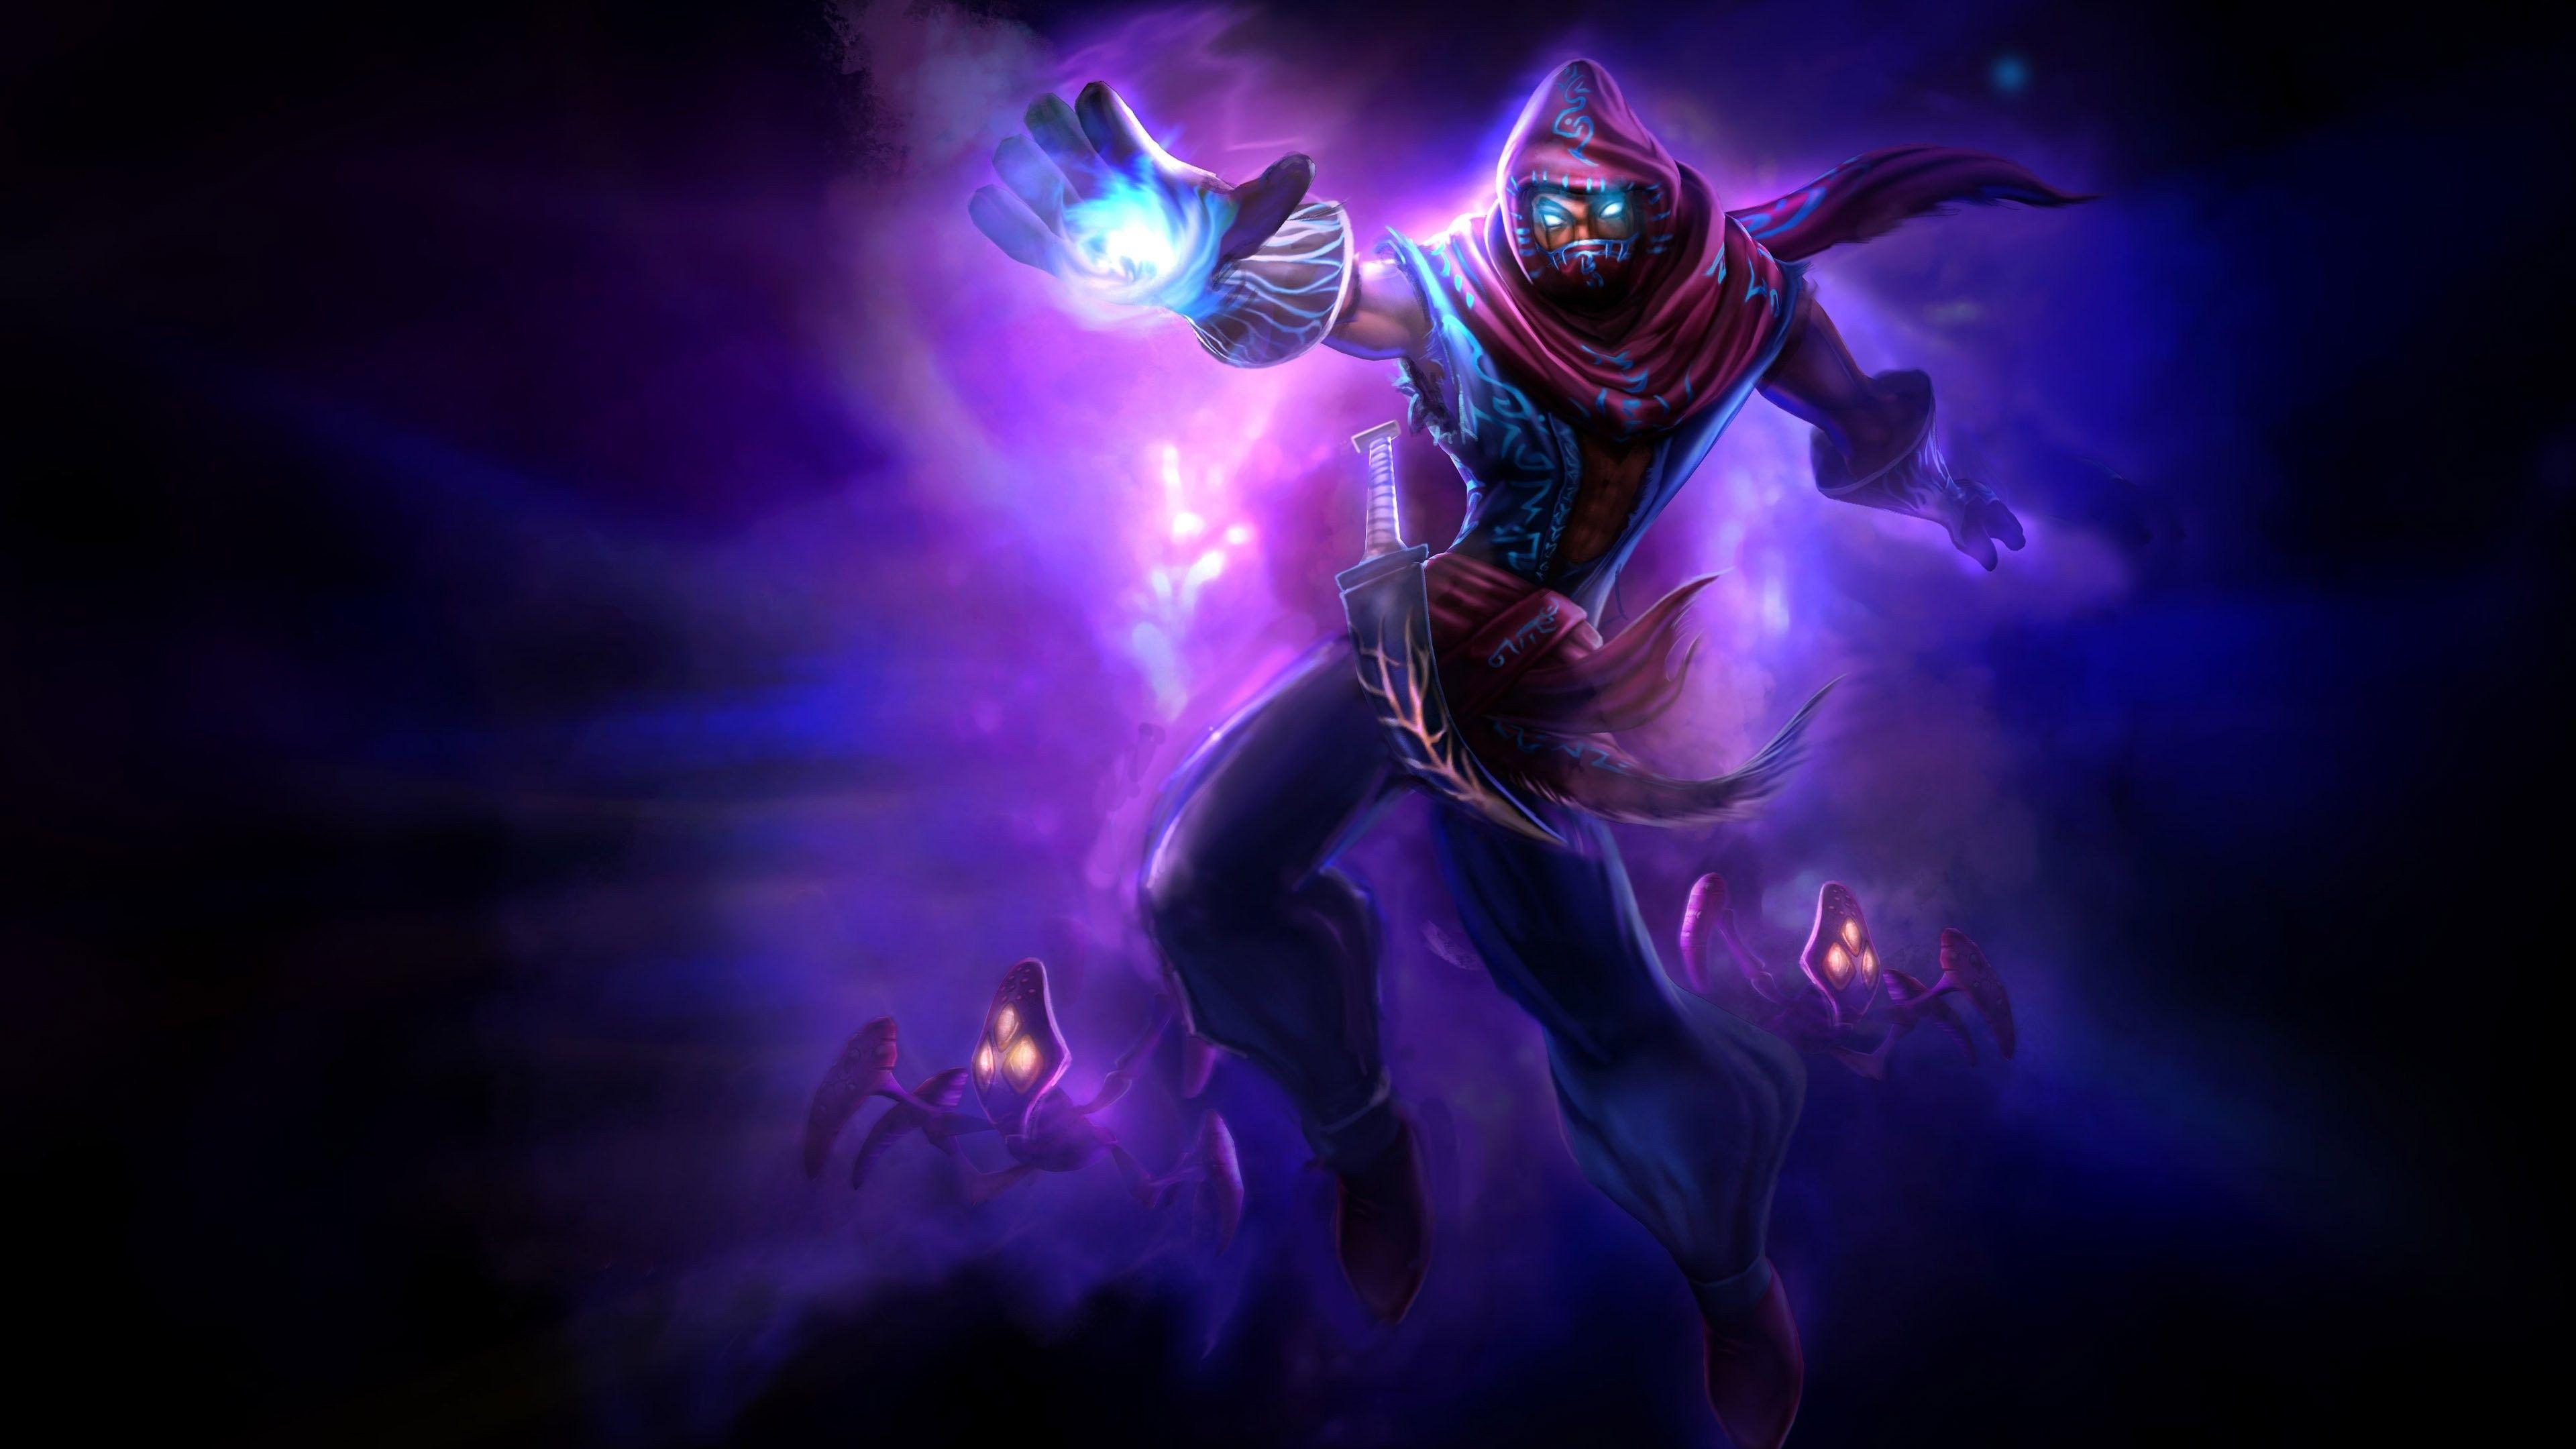 Download Latest League Of Legends Malzahar 4k Wallpaper